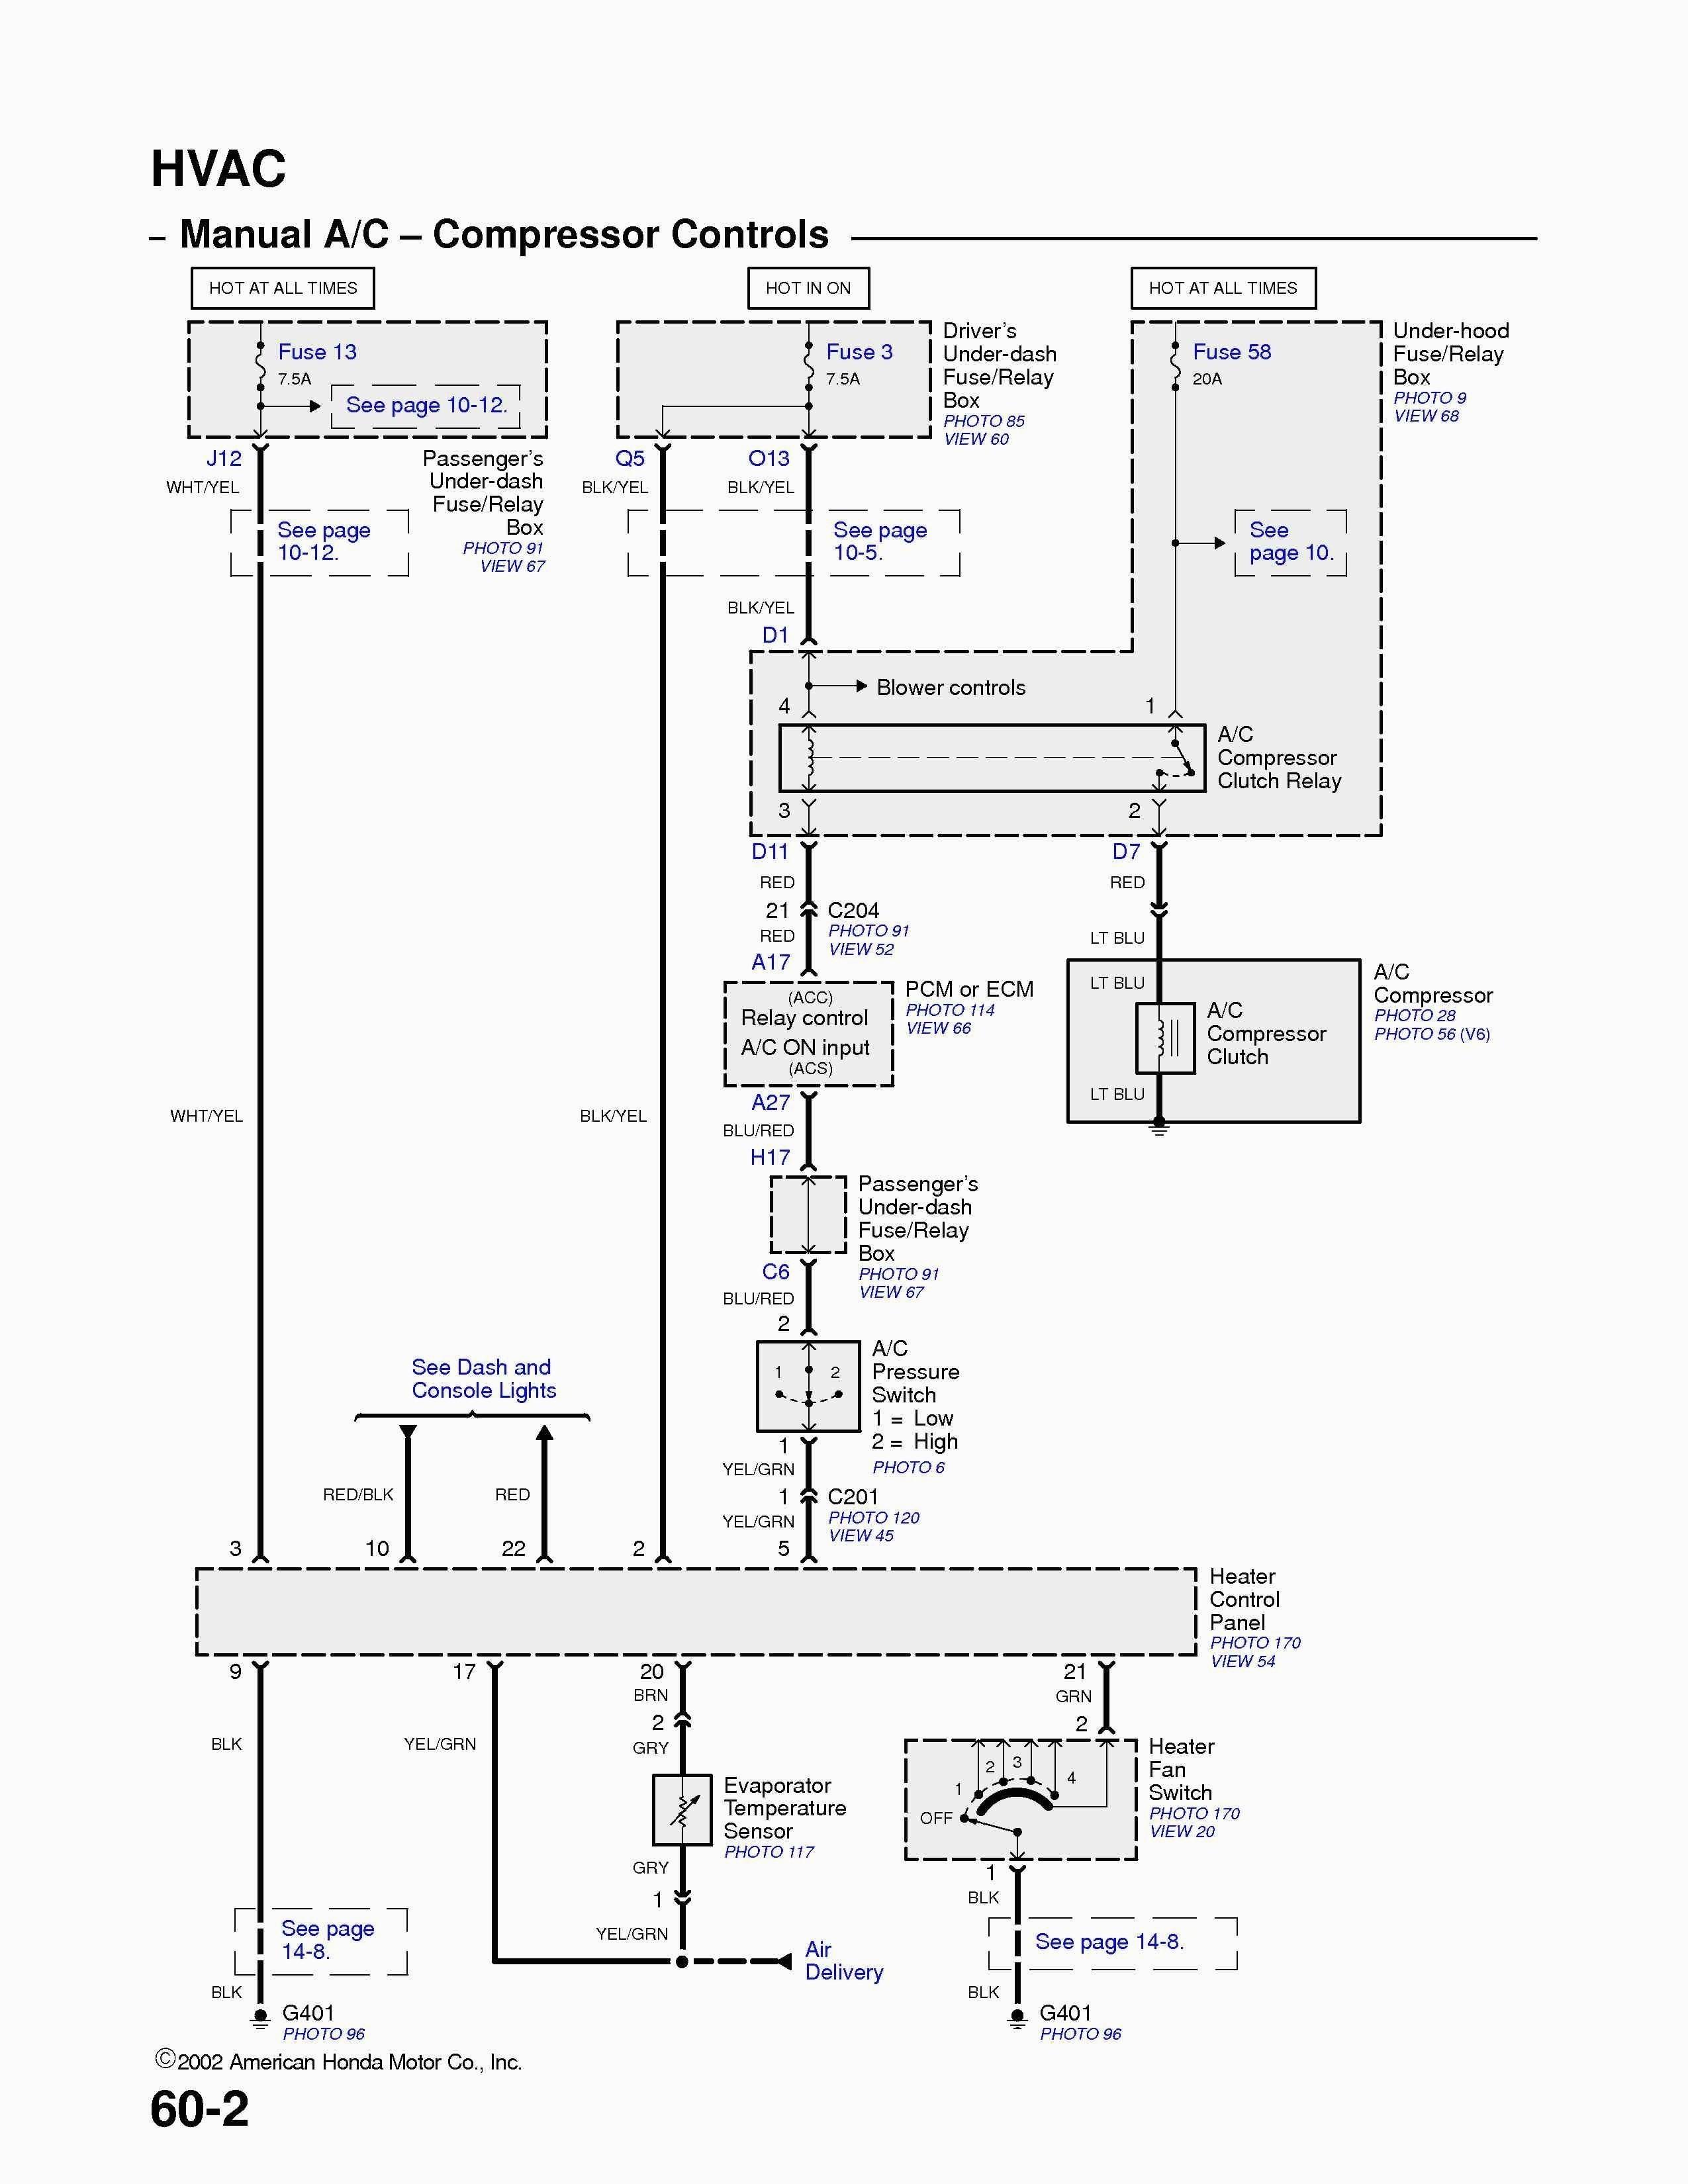 1999 Honda Accord Engine Diagram 99 Accord Wiring Diagram Wiring Diagrams Schematics • Of 1999 Honda Accord Engine Diagram